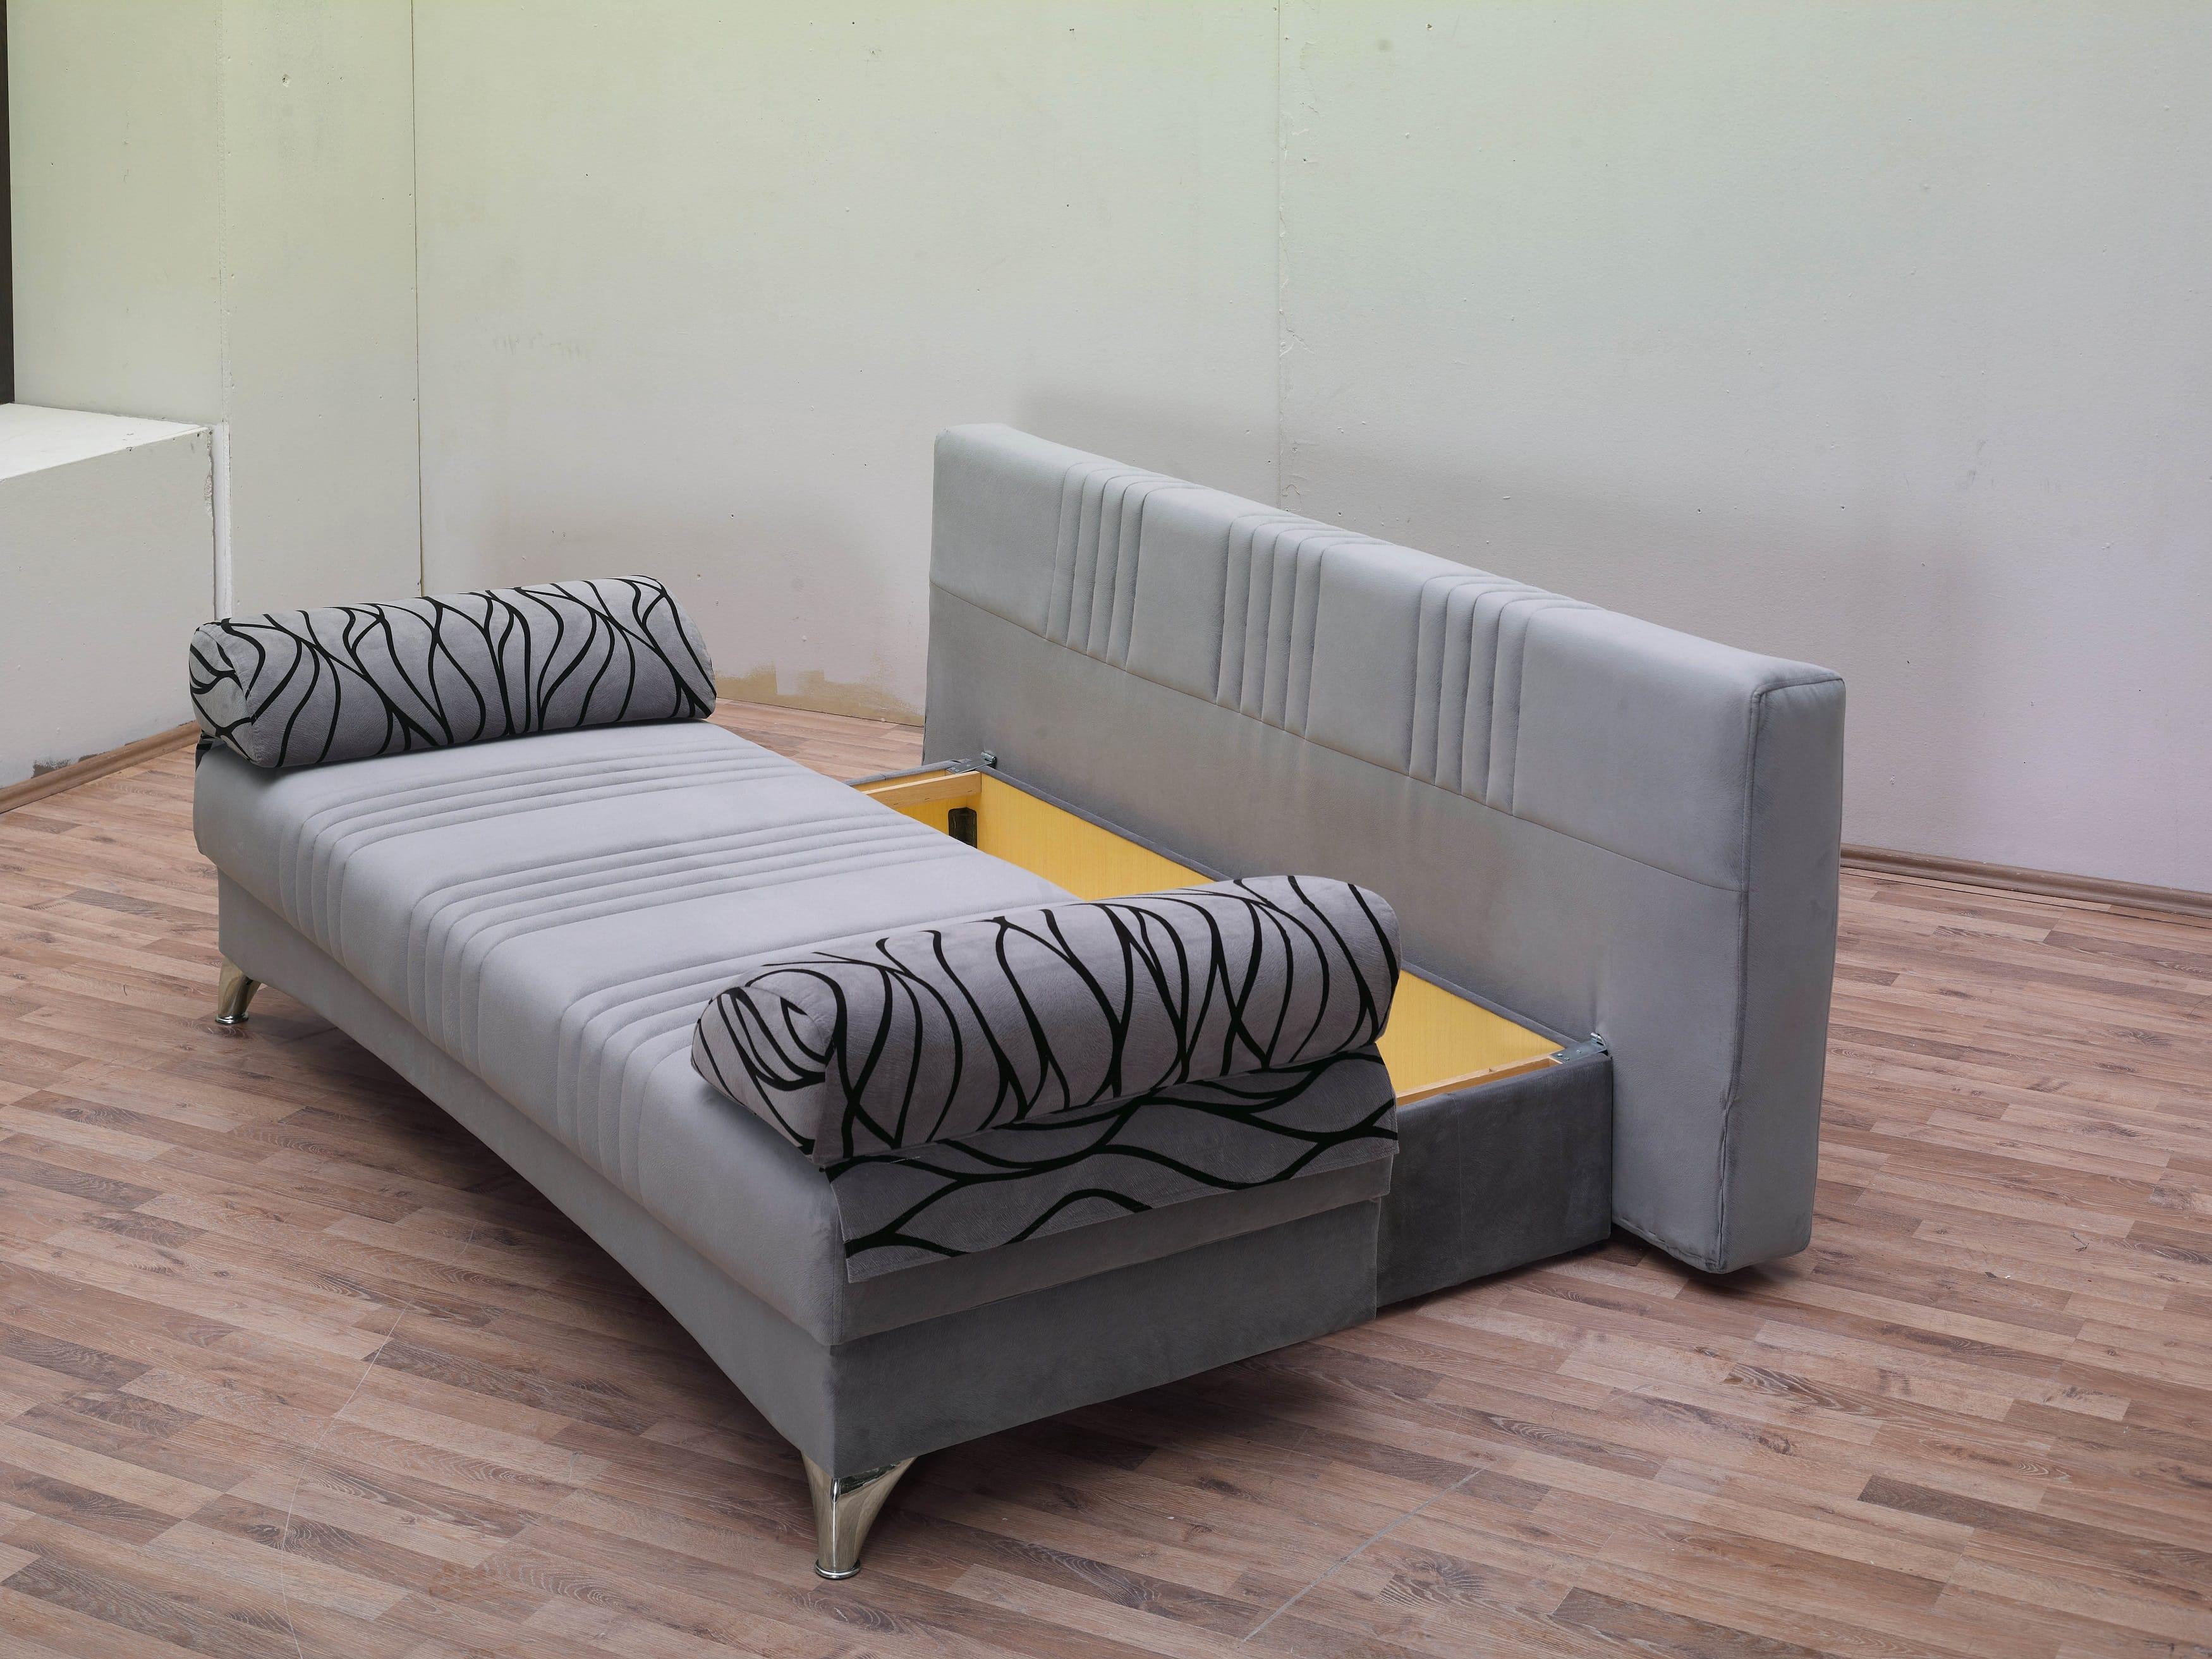 Daisy Gray Sofa Bed by Empire Furniture USA